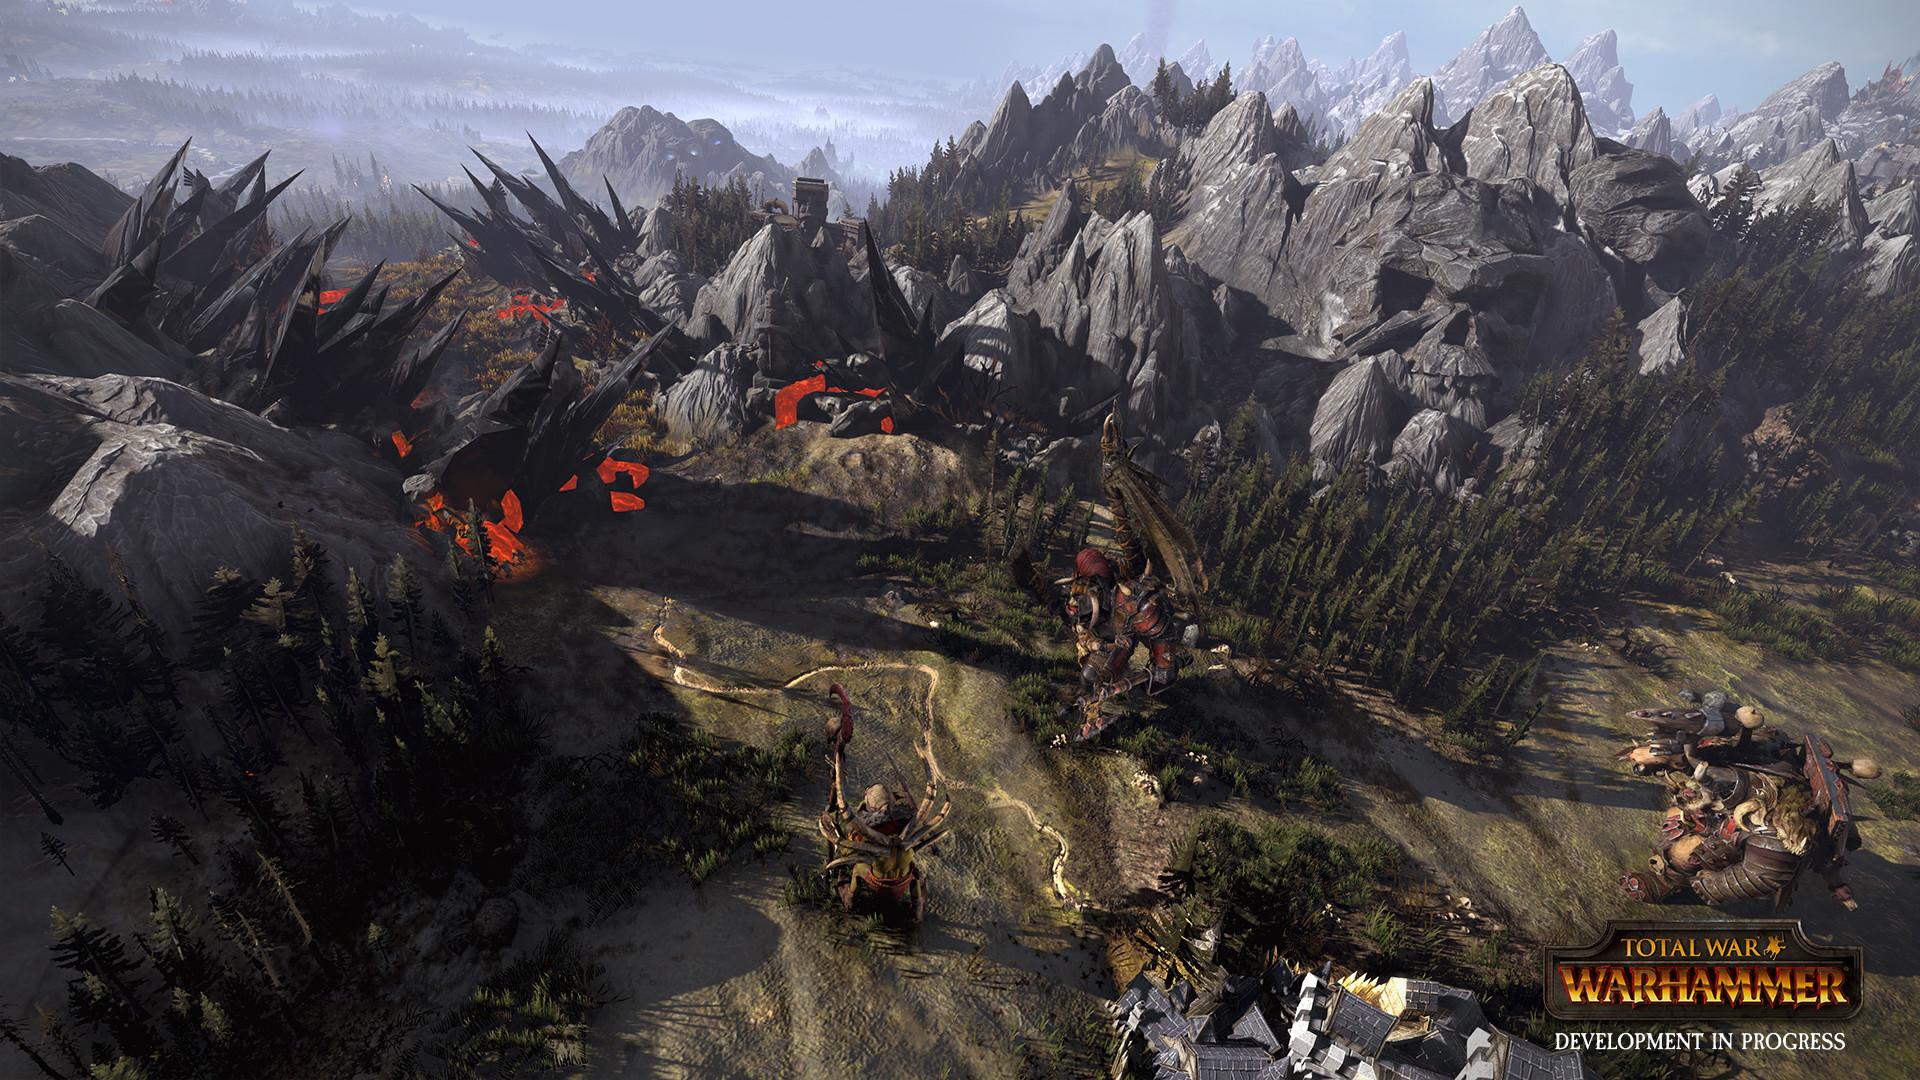 empire total war patch 1.6 download crack